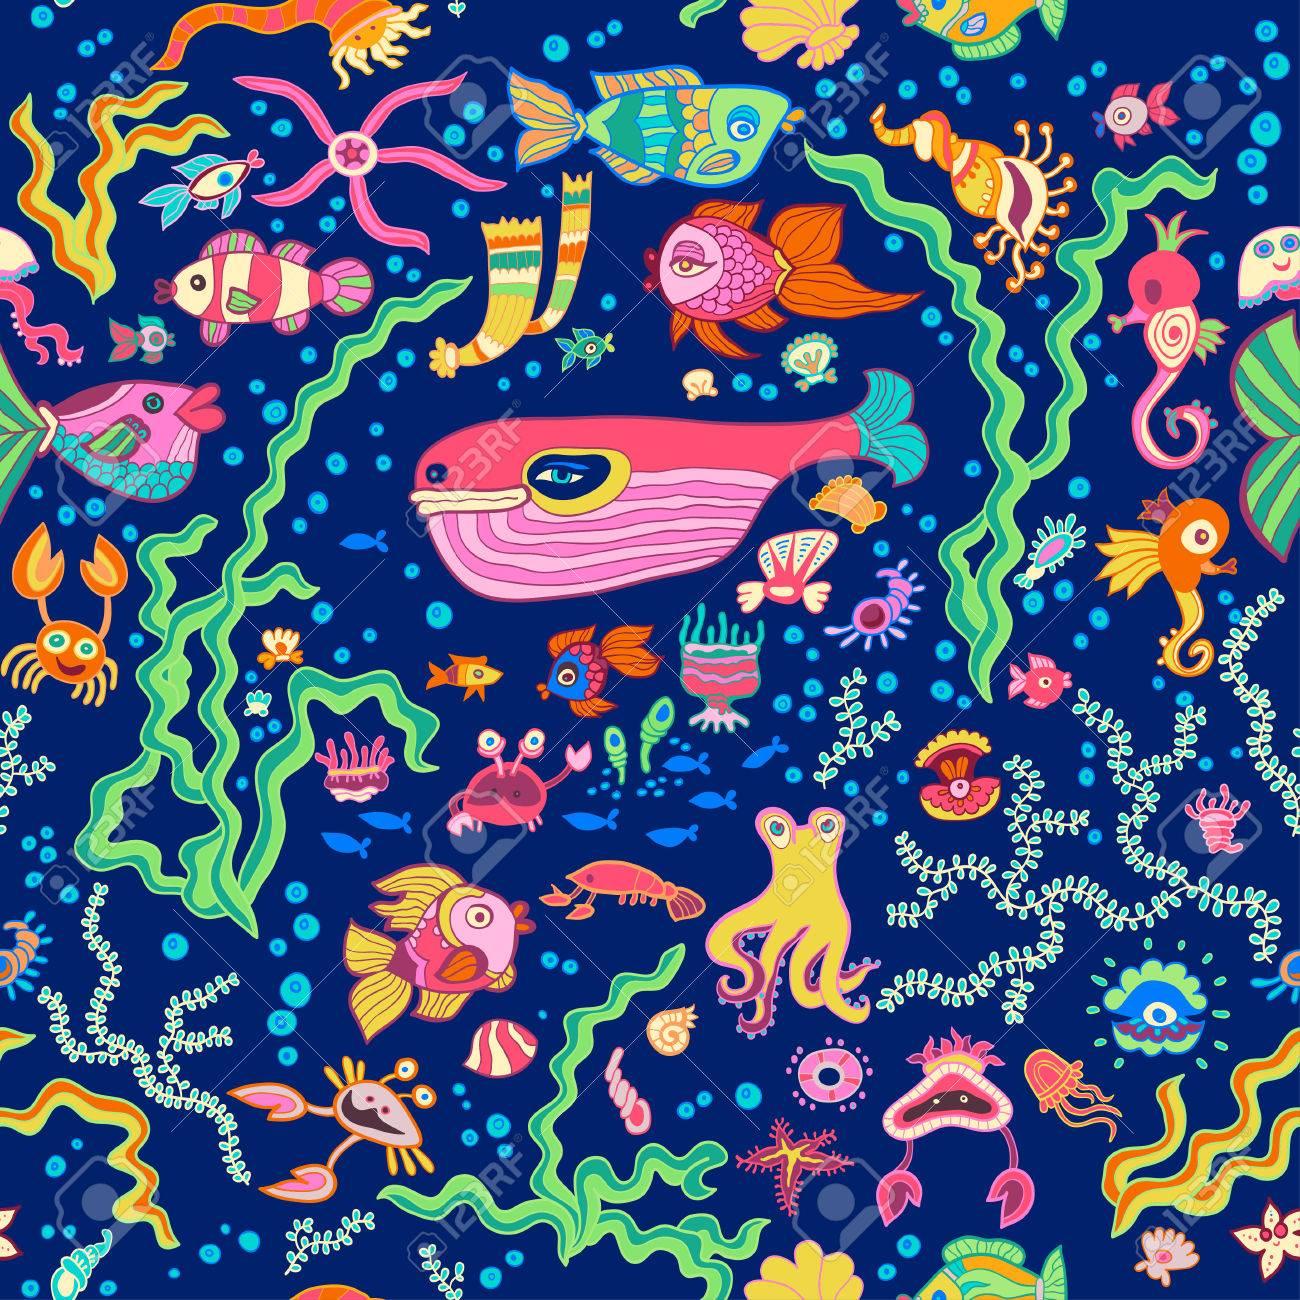 Childish pattern with marine life Stock Vector - 27567307